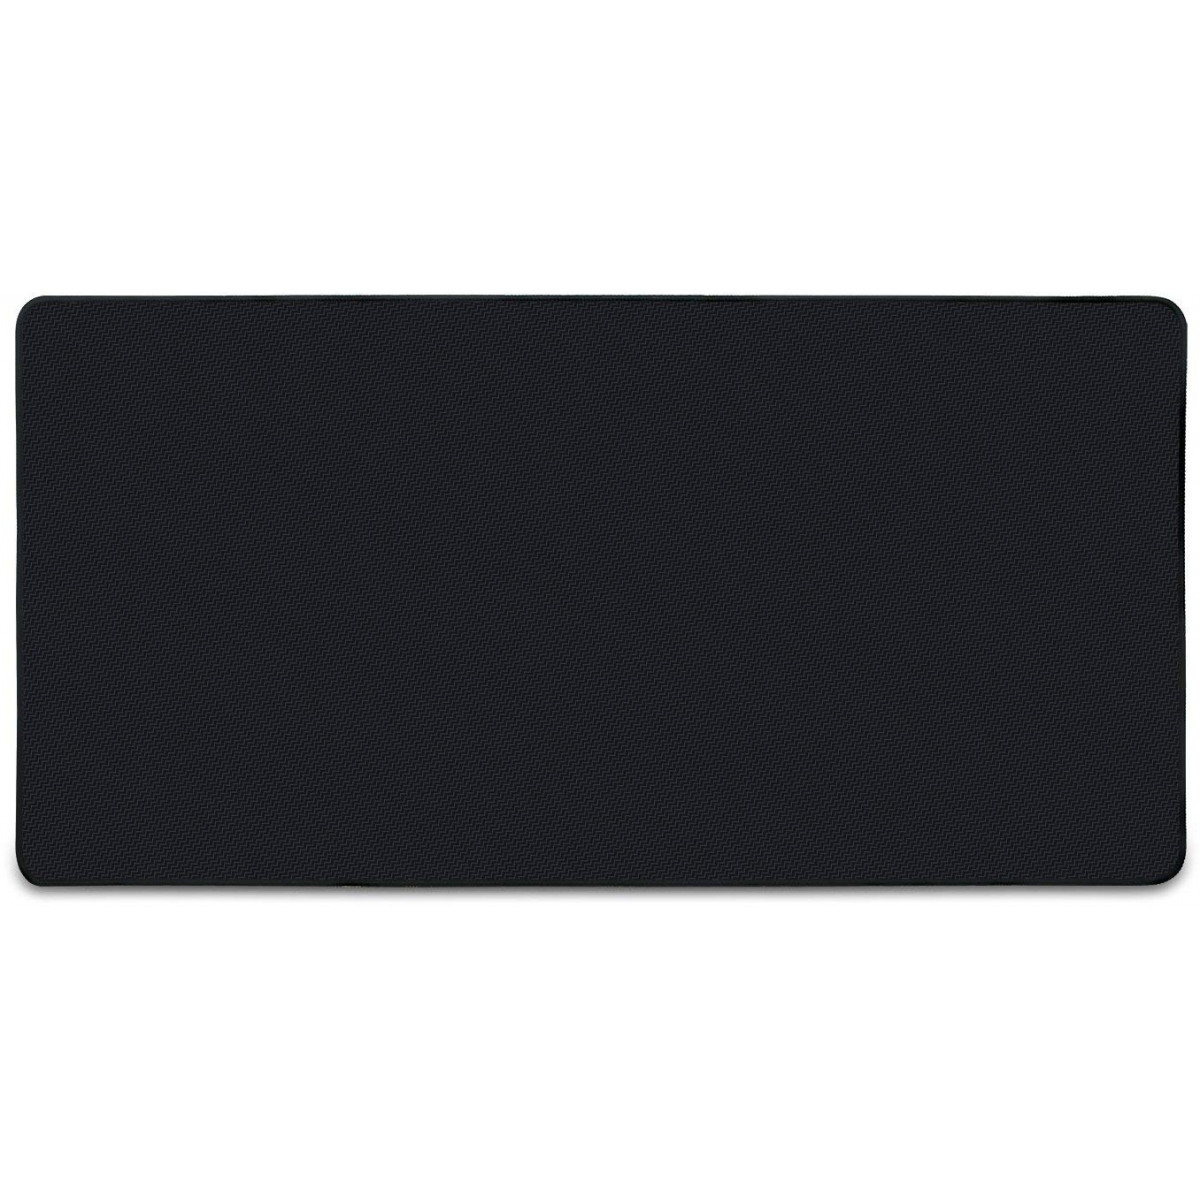 Mousepad Redragon Gamer Kunlun Control Médio P005A